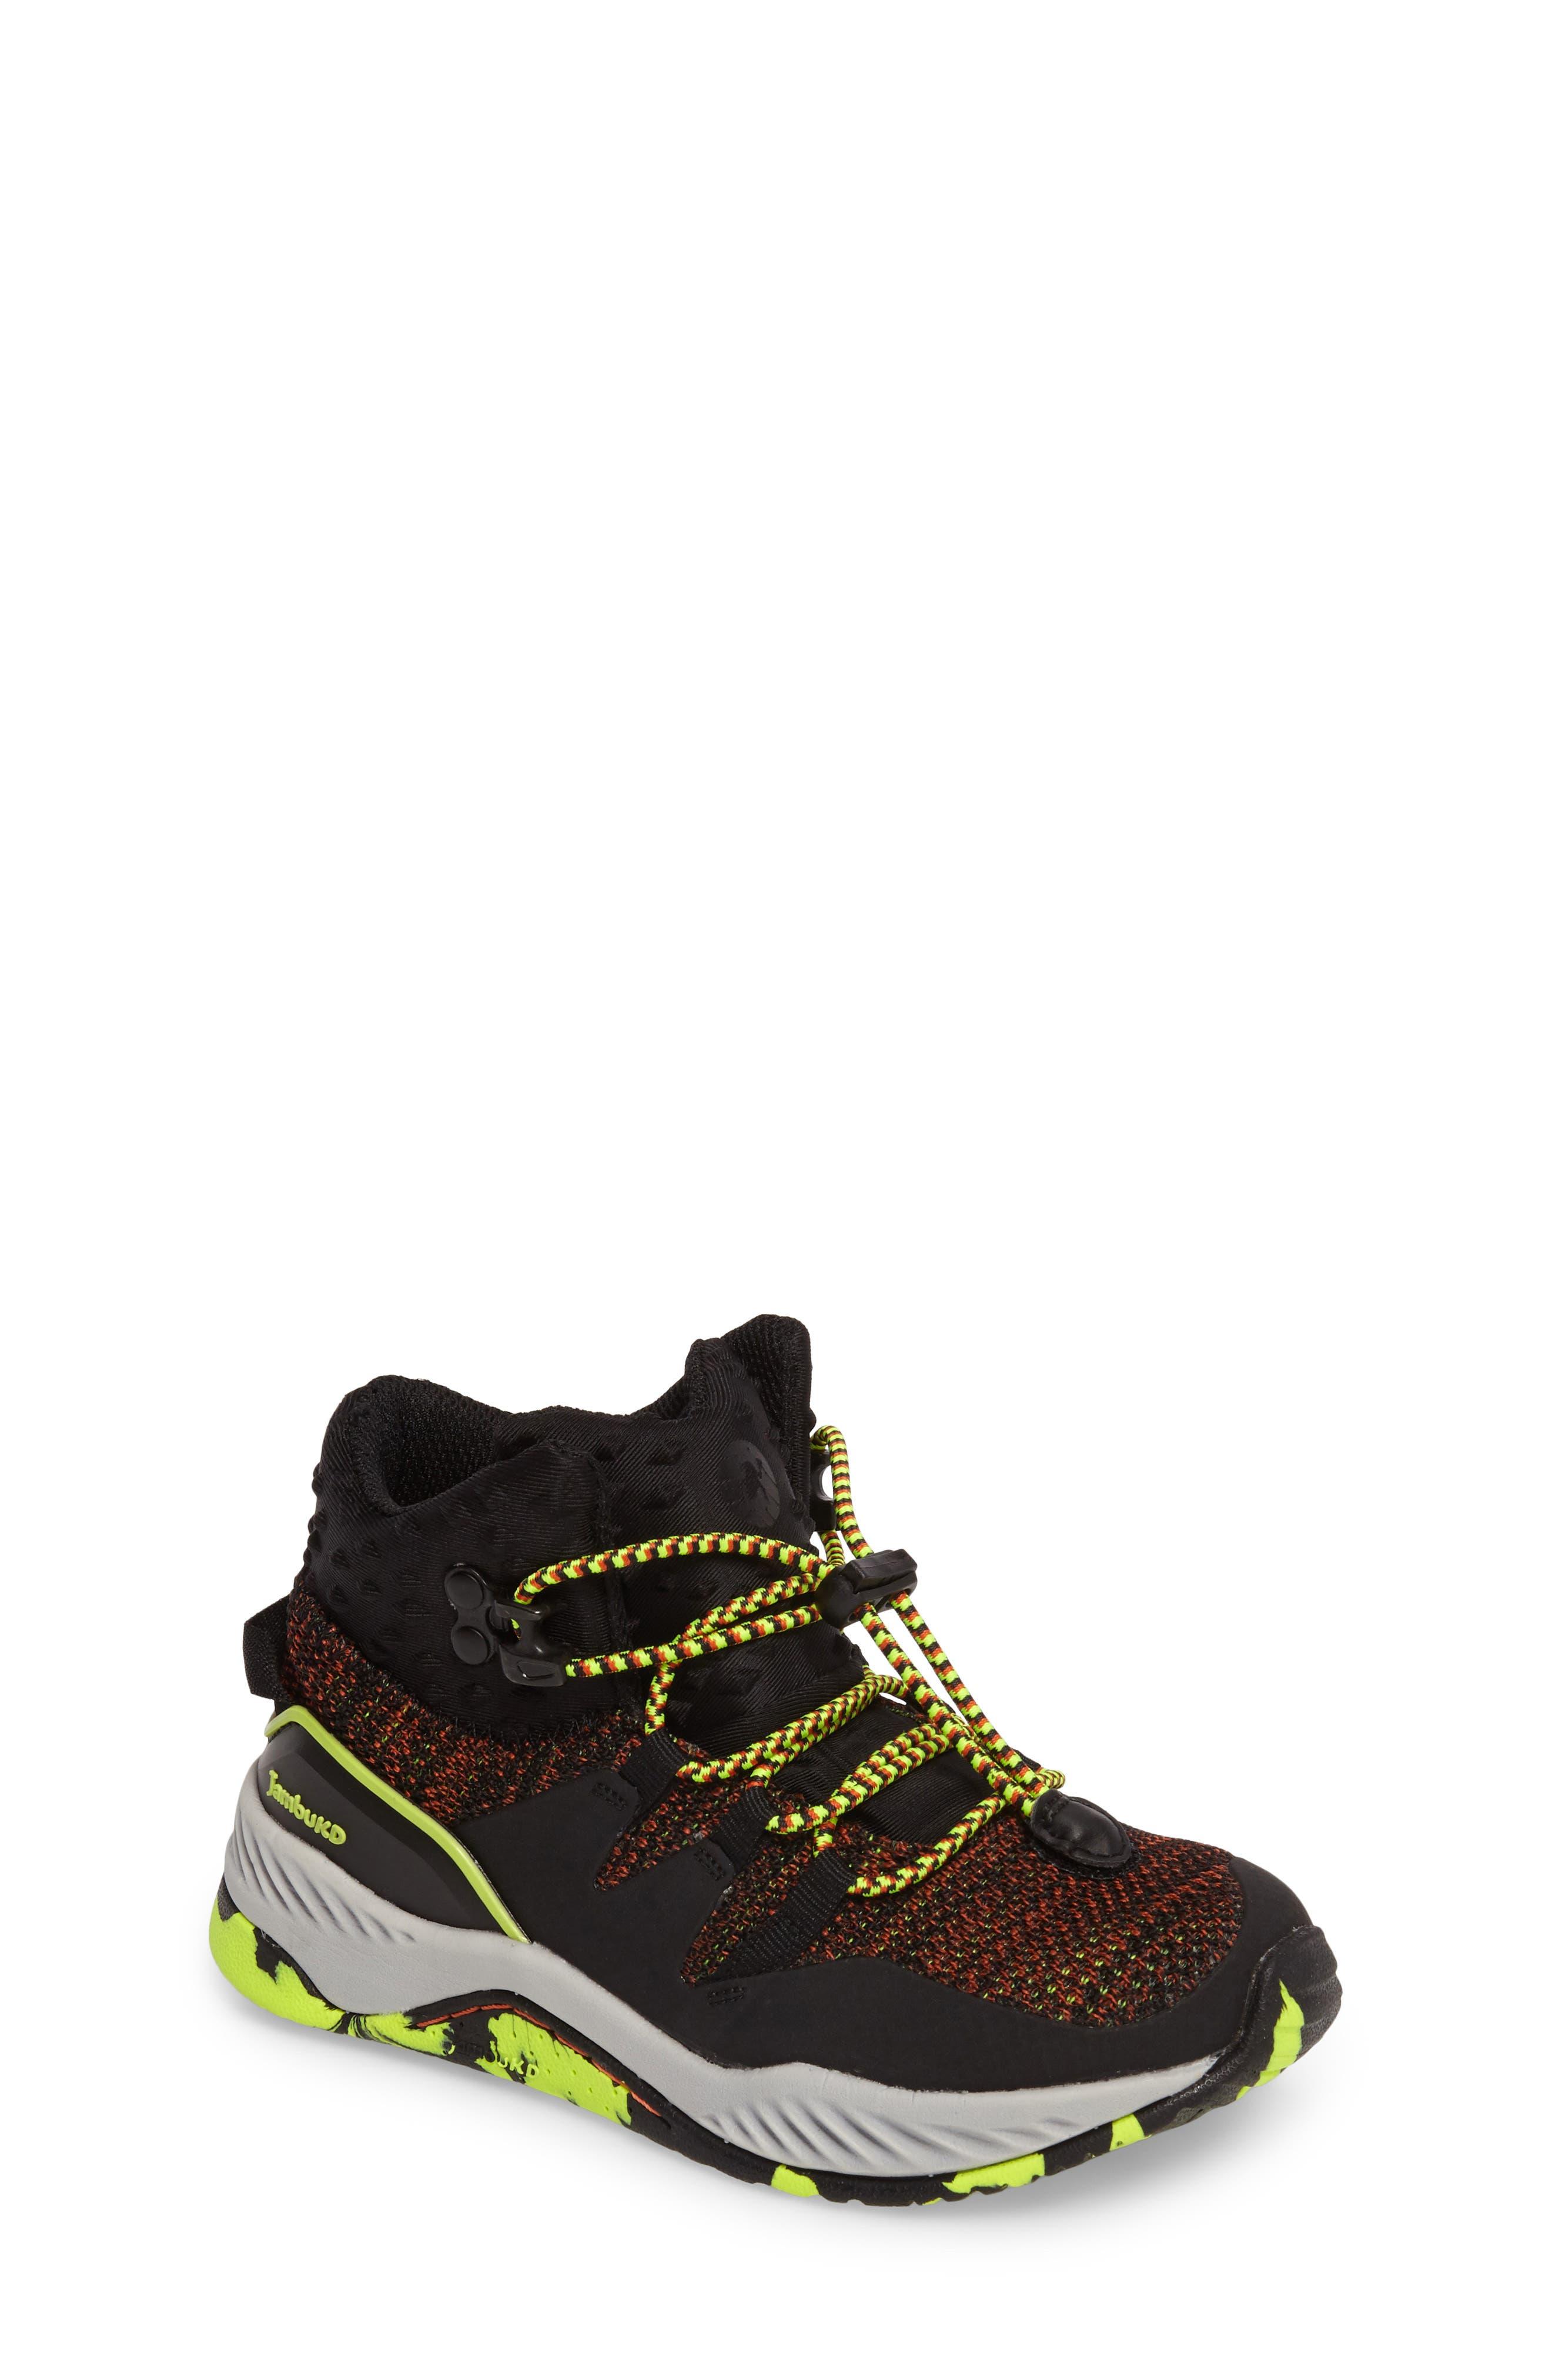 Armadillo Sneaker Boot,                             Main thumbnail 1, color,                             Black